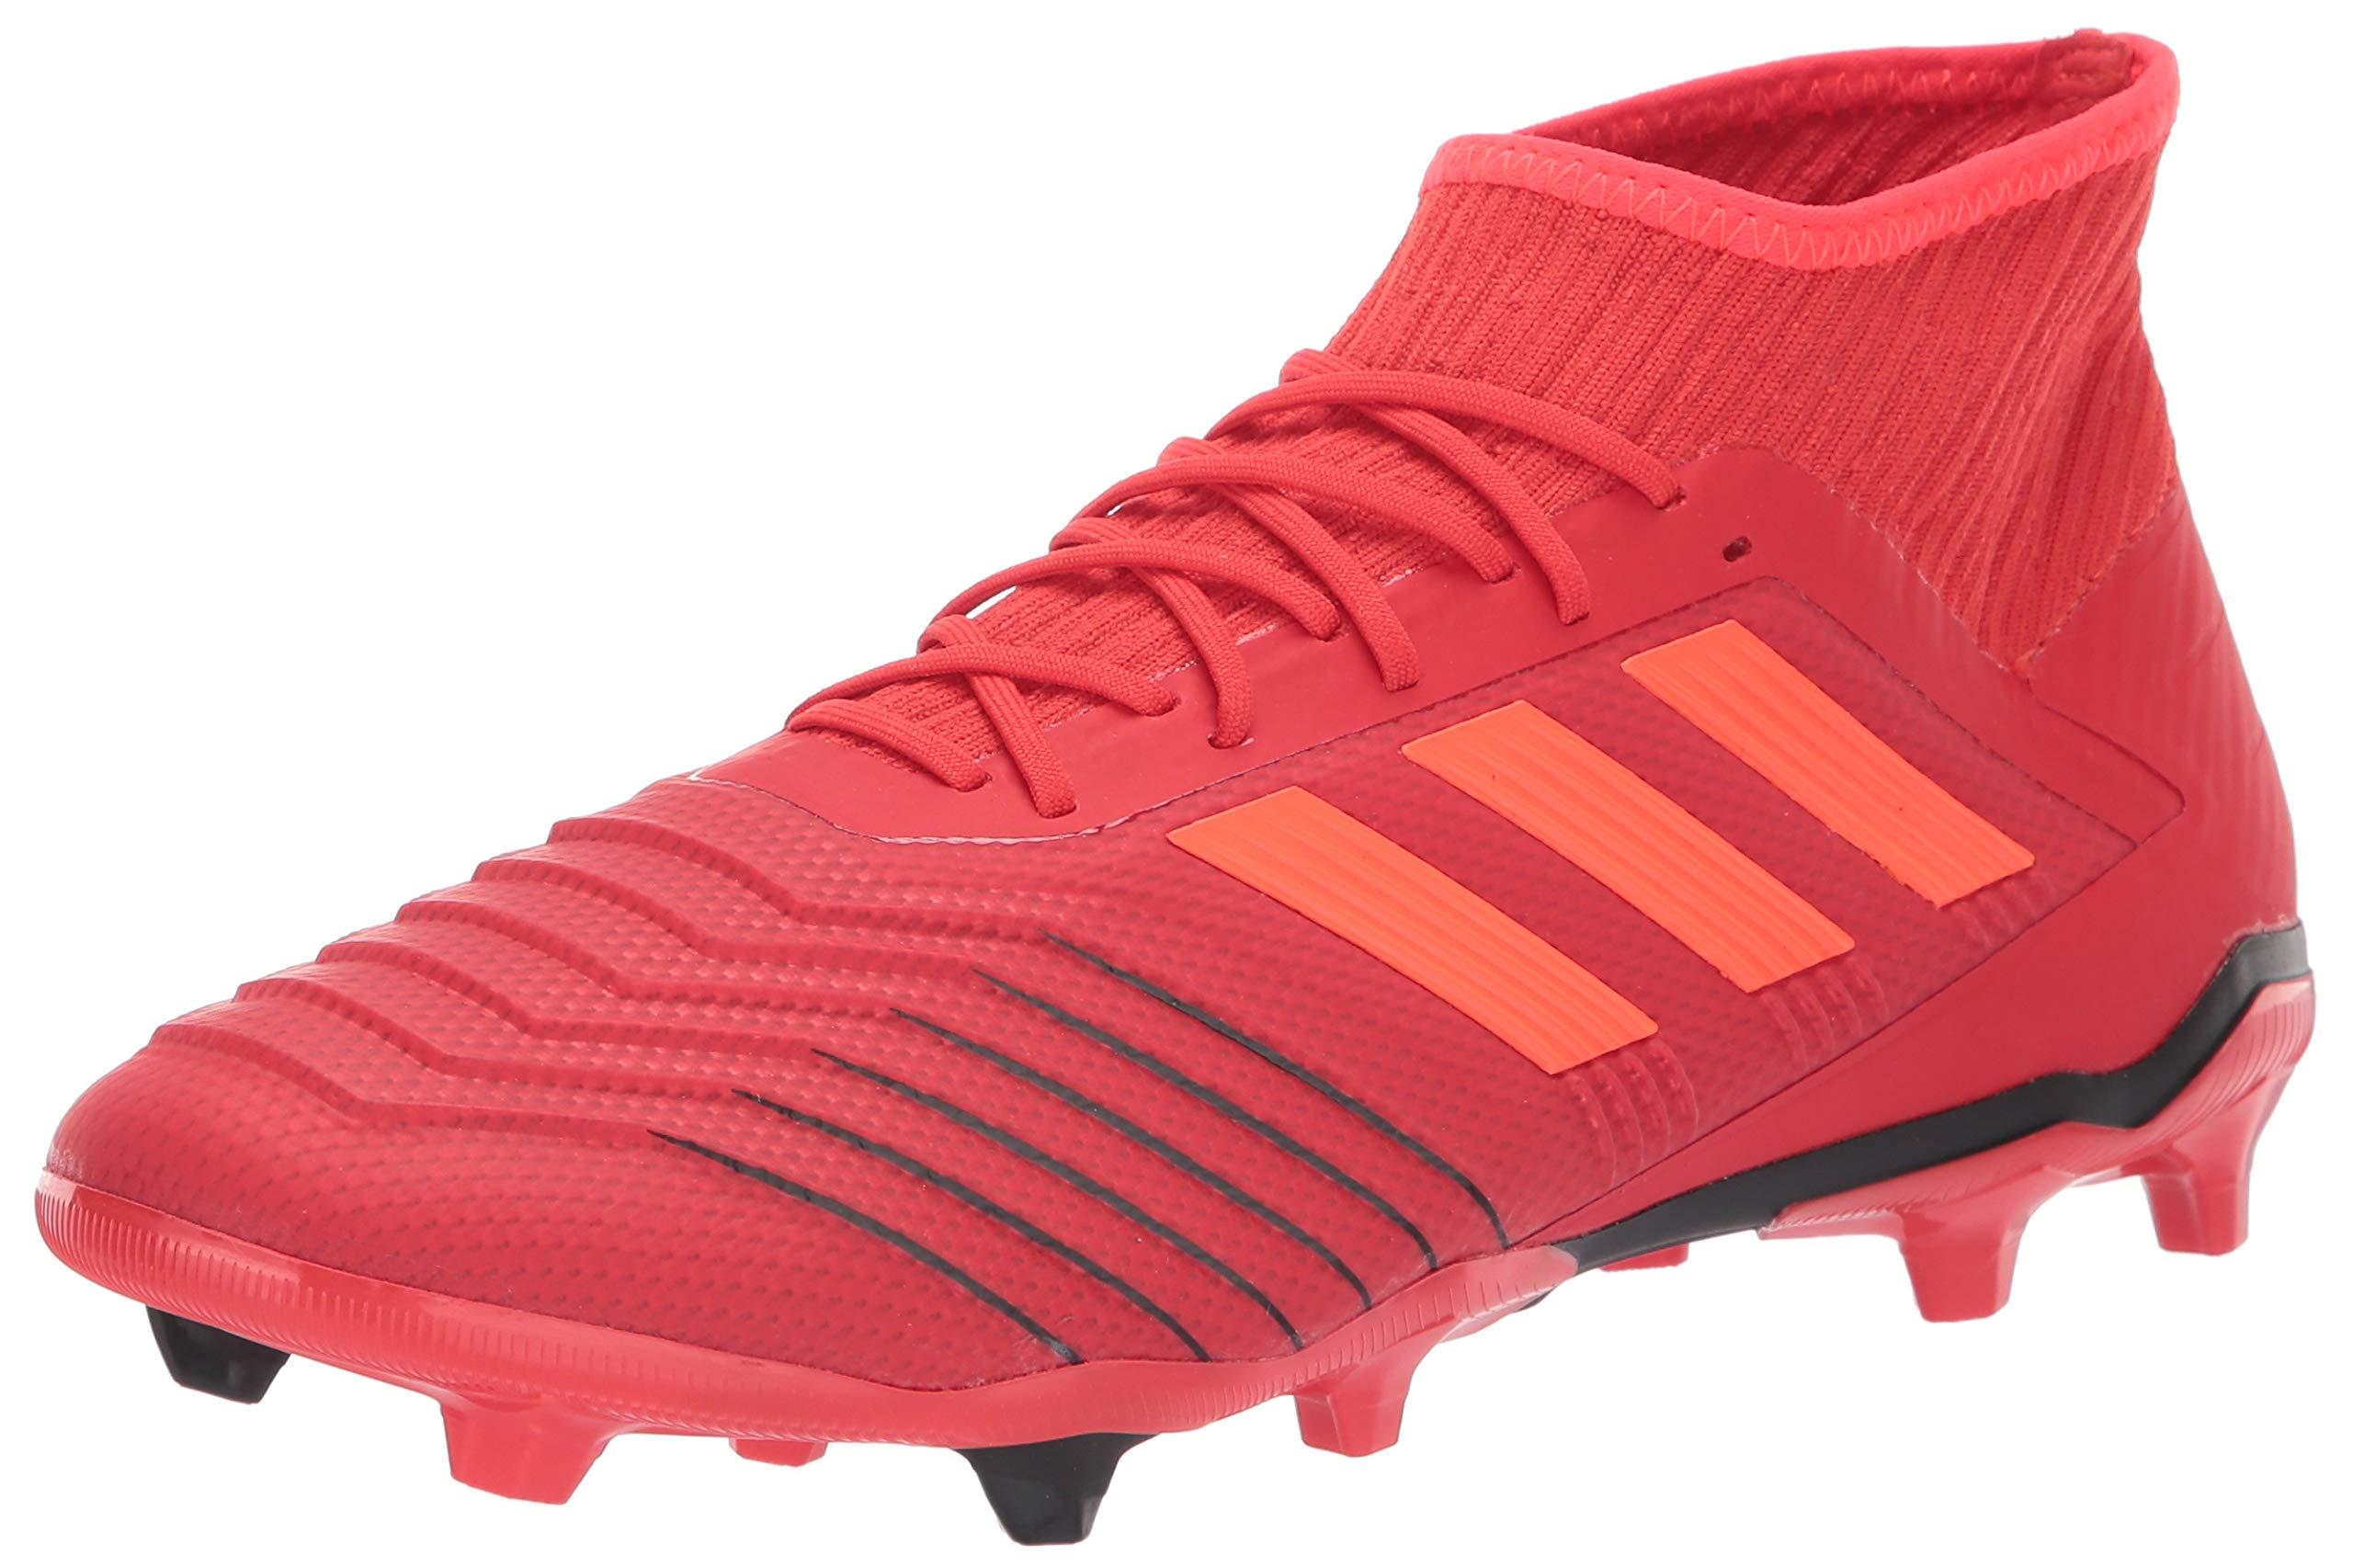 adidas Men's Predator 19.2 Firm Ground, Active Solar red/Black, 7 M US